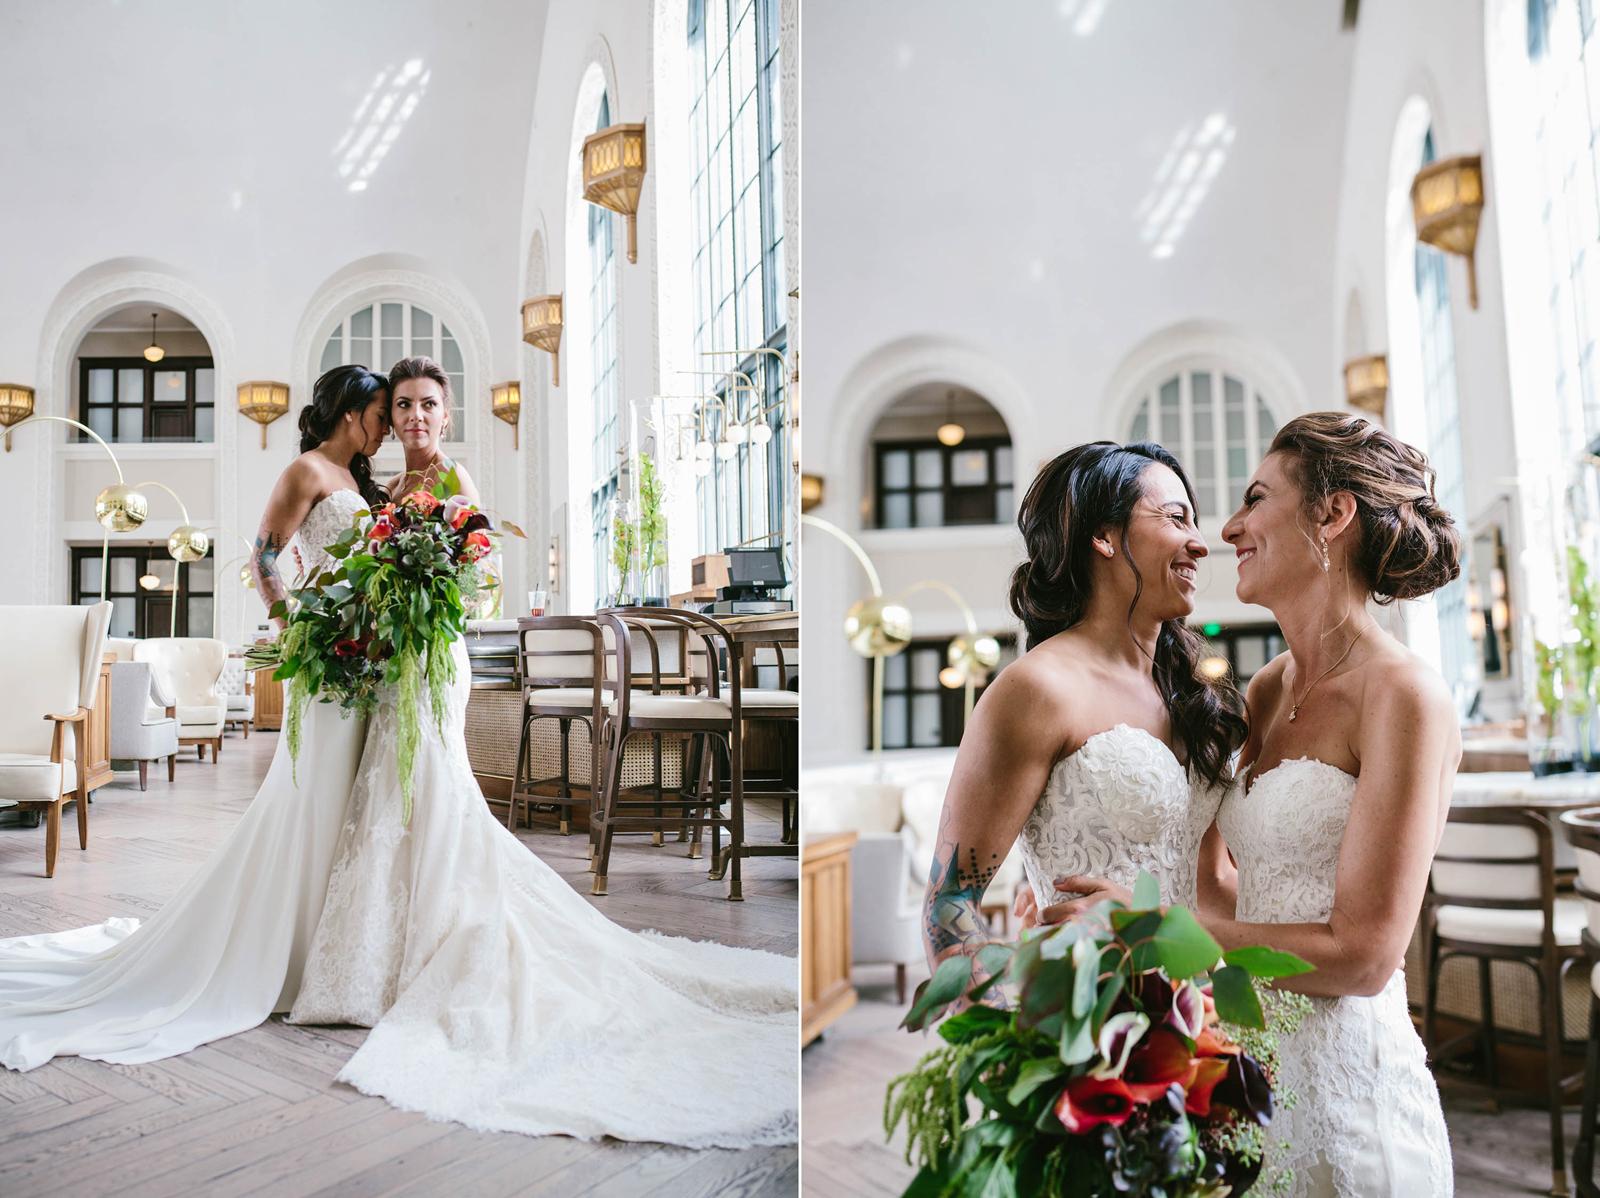 daf021d0feb Jovan + Emily s Wedding    Union Station + Moss    Denver